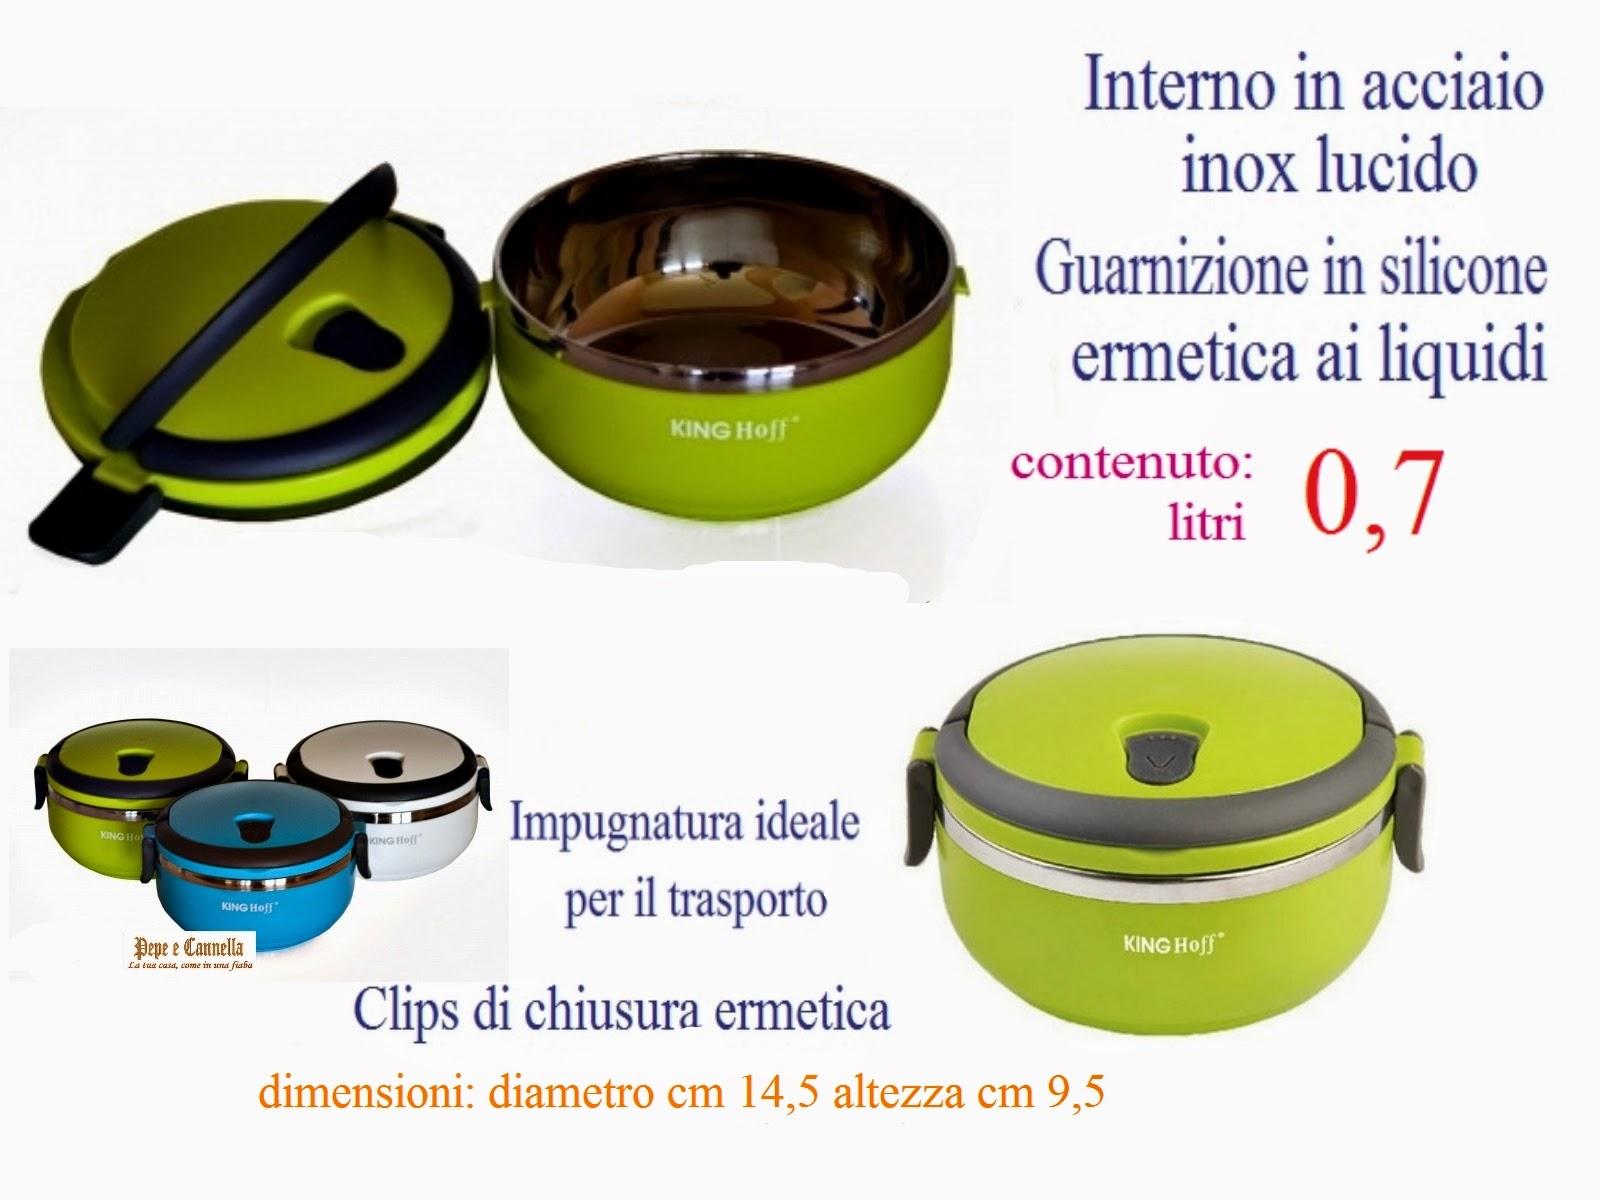 Portavivande thermos contenitore termico ermetico gamella for Portavivande termico